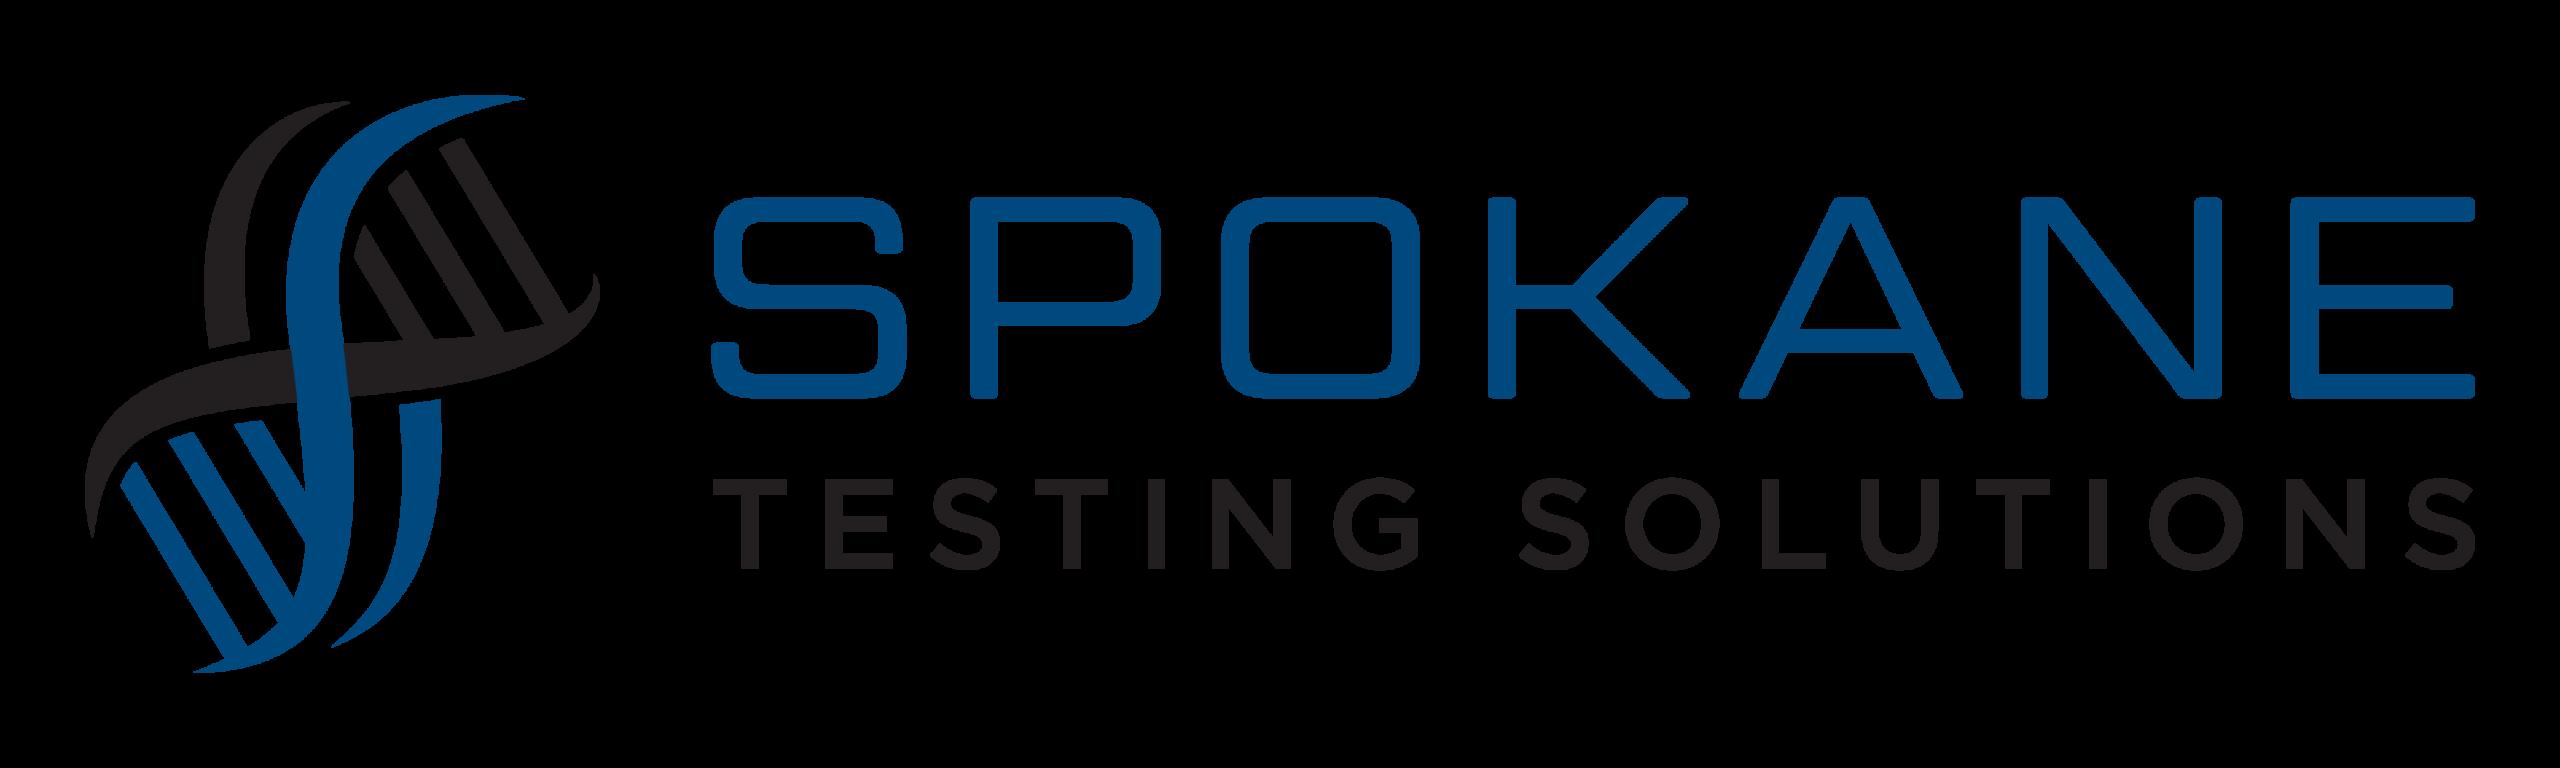 Spokane Testing Solutions